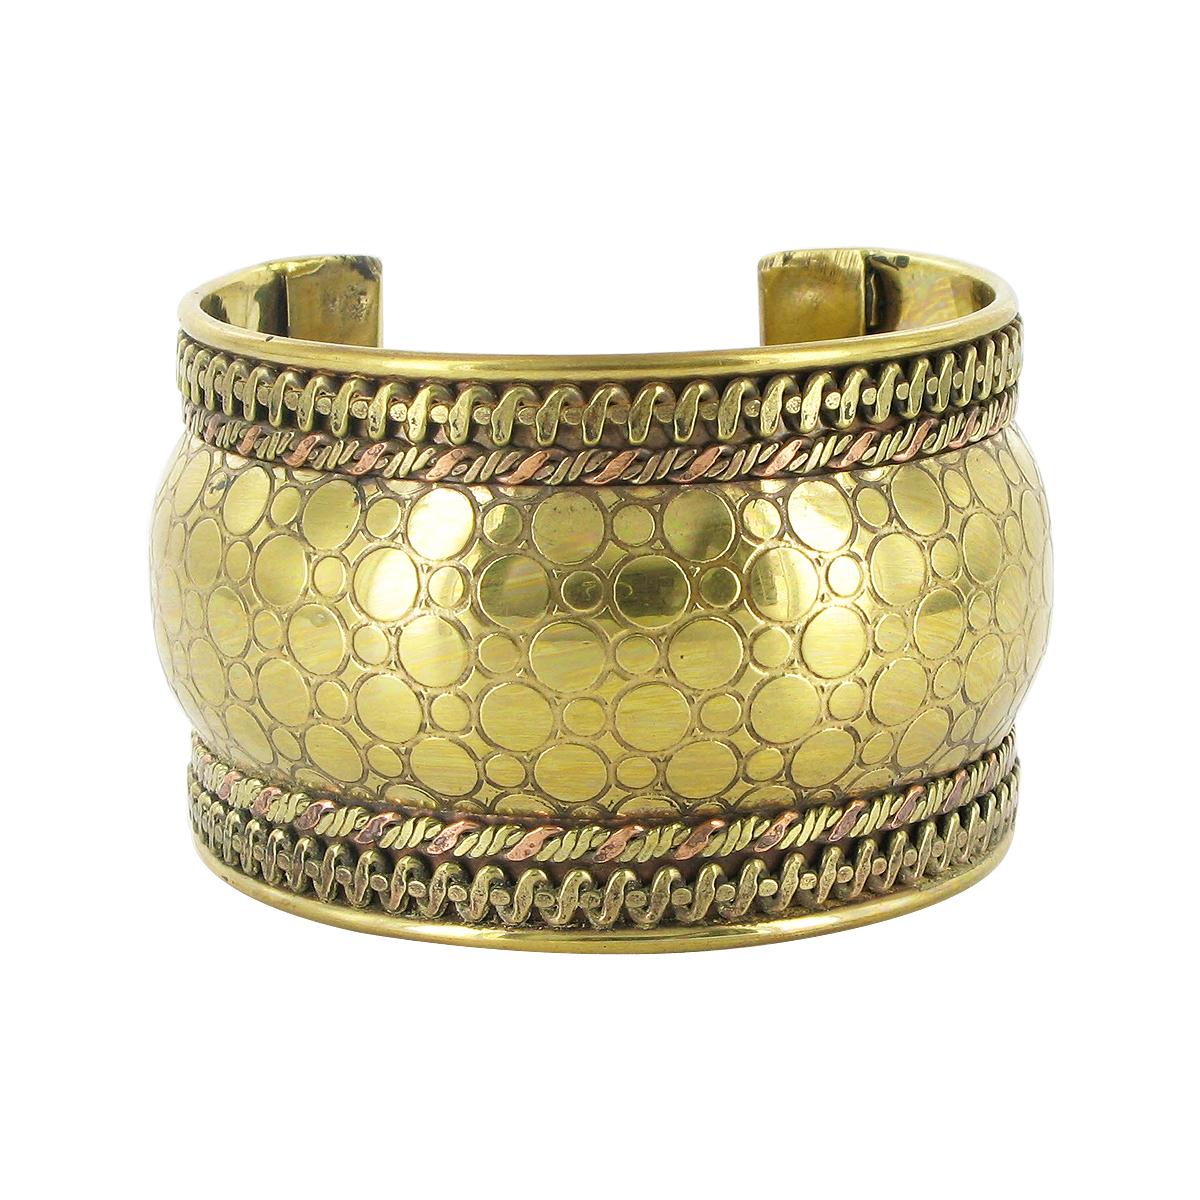 Gem Avenue 41mm wide Designer Two Tone Finish Fashion Cuff Bracelet